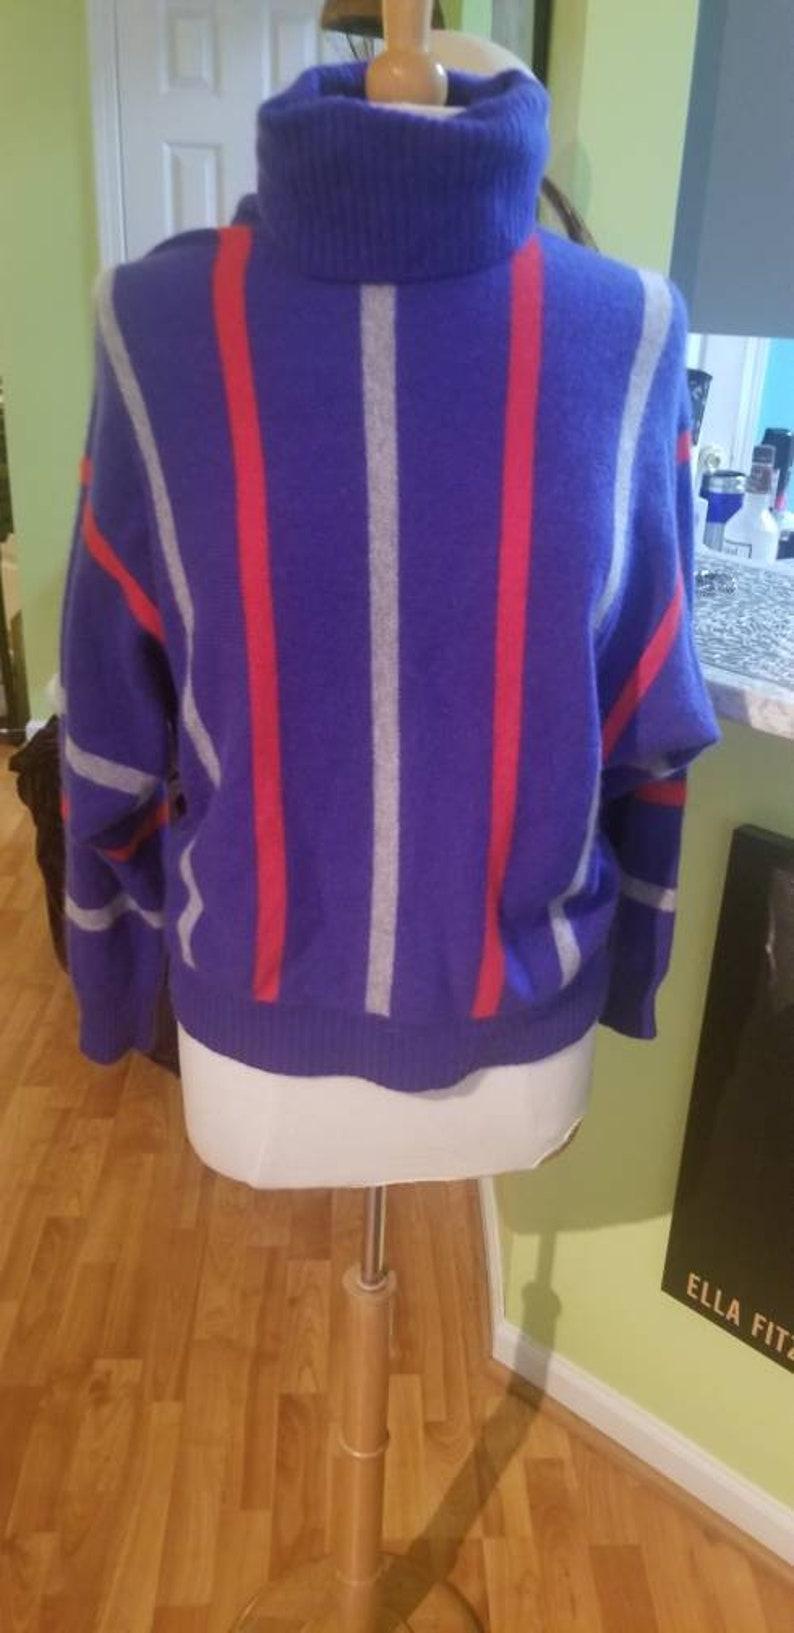 6a2c75cdaa9e Vintage Sportwhirl Plush 2-Ply Cashmere Turtleneck Sweater